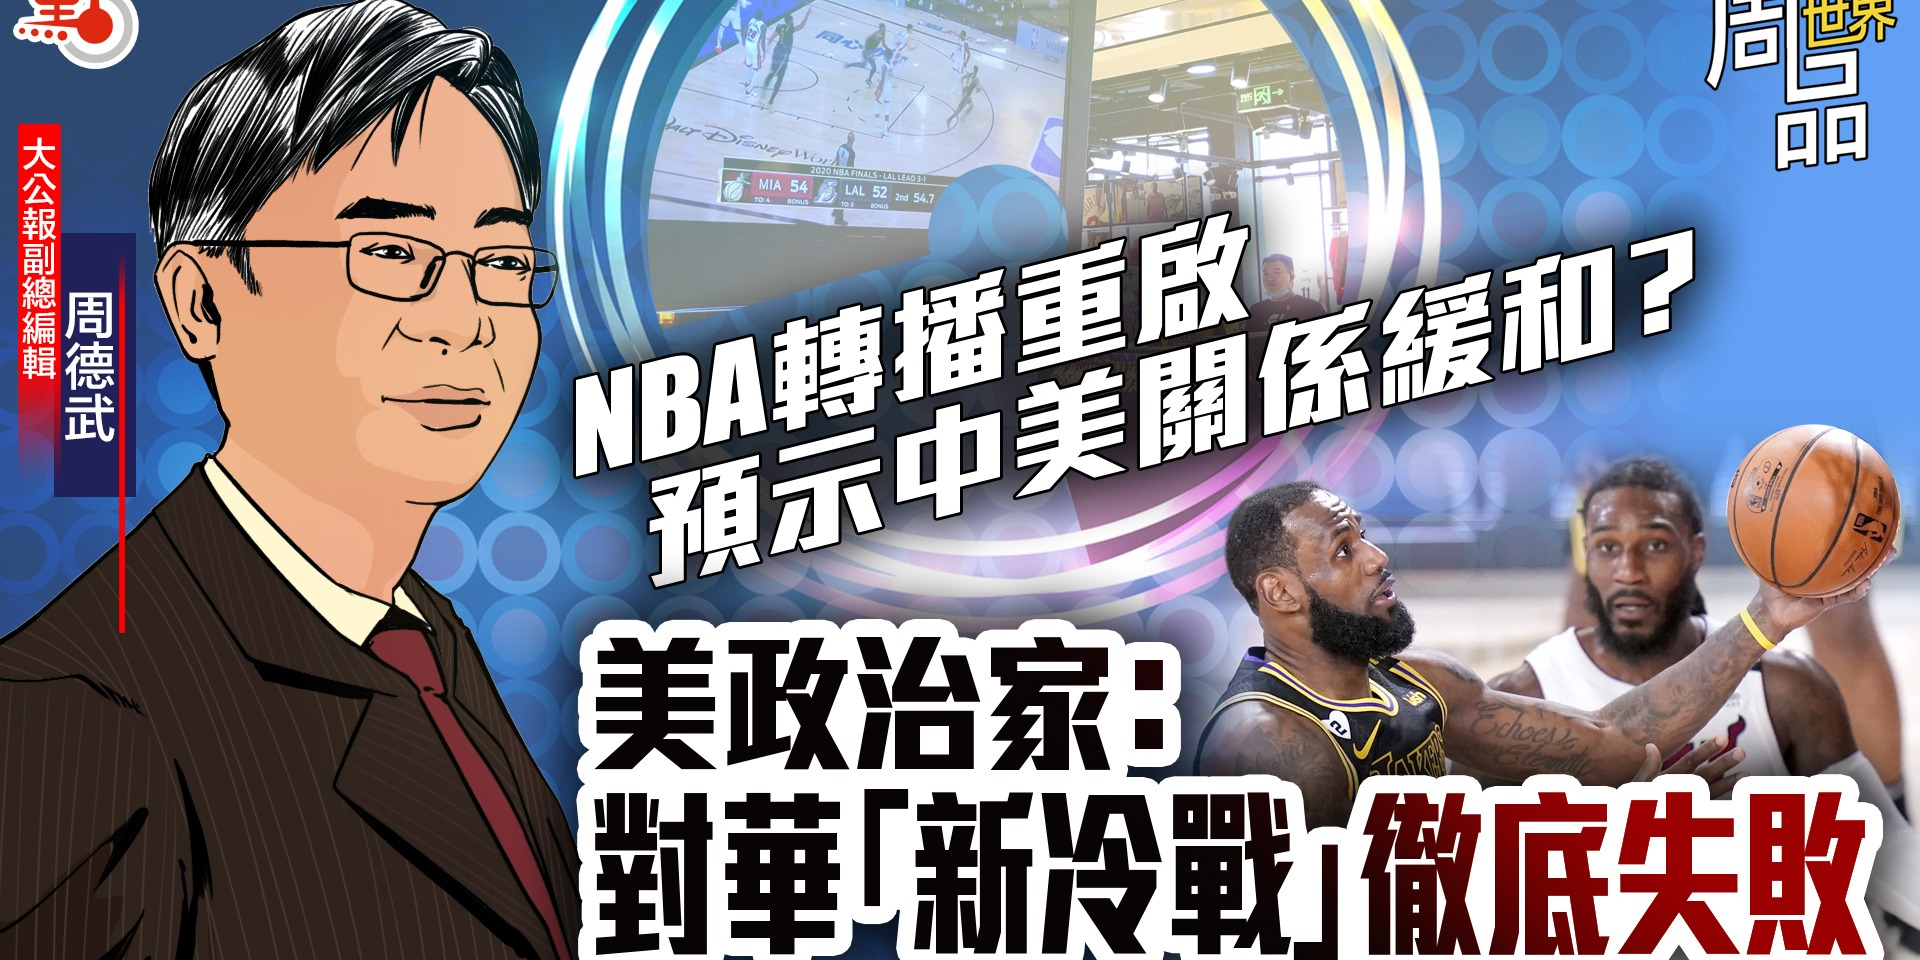 NBA轉播重啟預示中美關係緩和?美政治家:對華「新冷戰」徹底失敗【周品世界EP8】